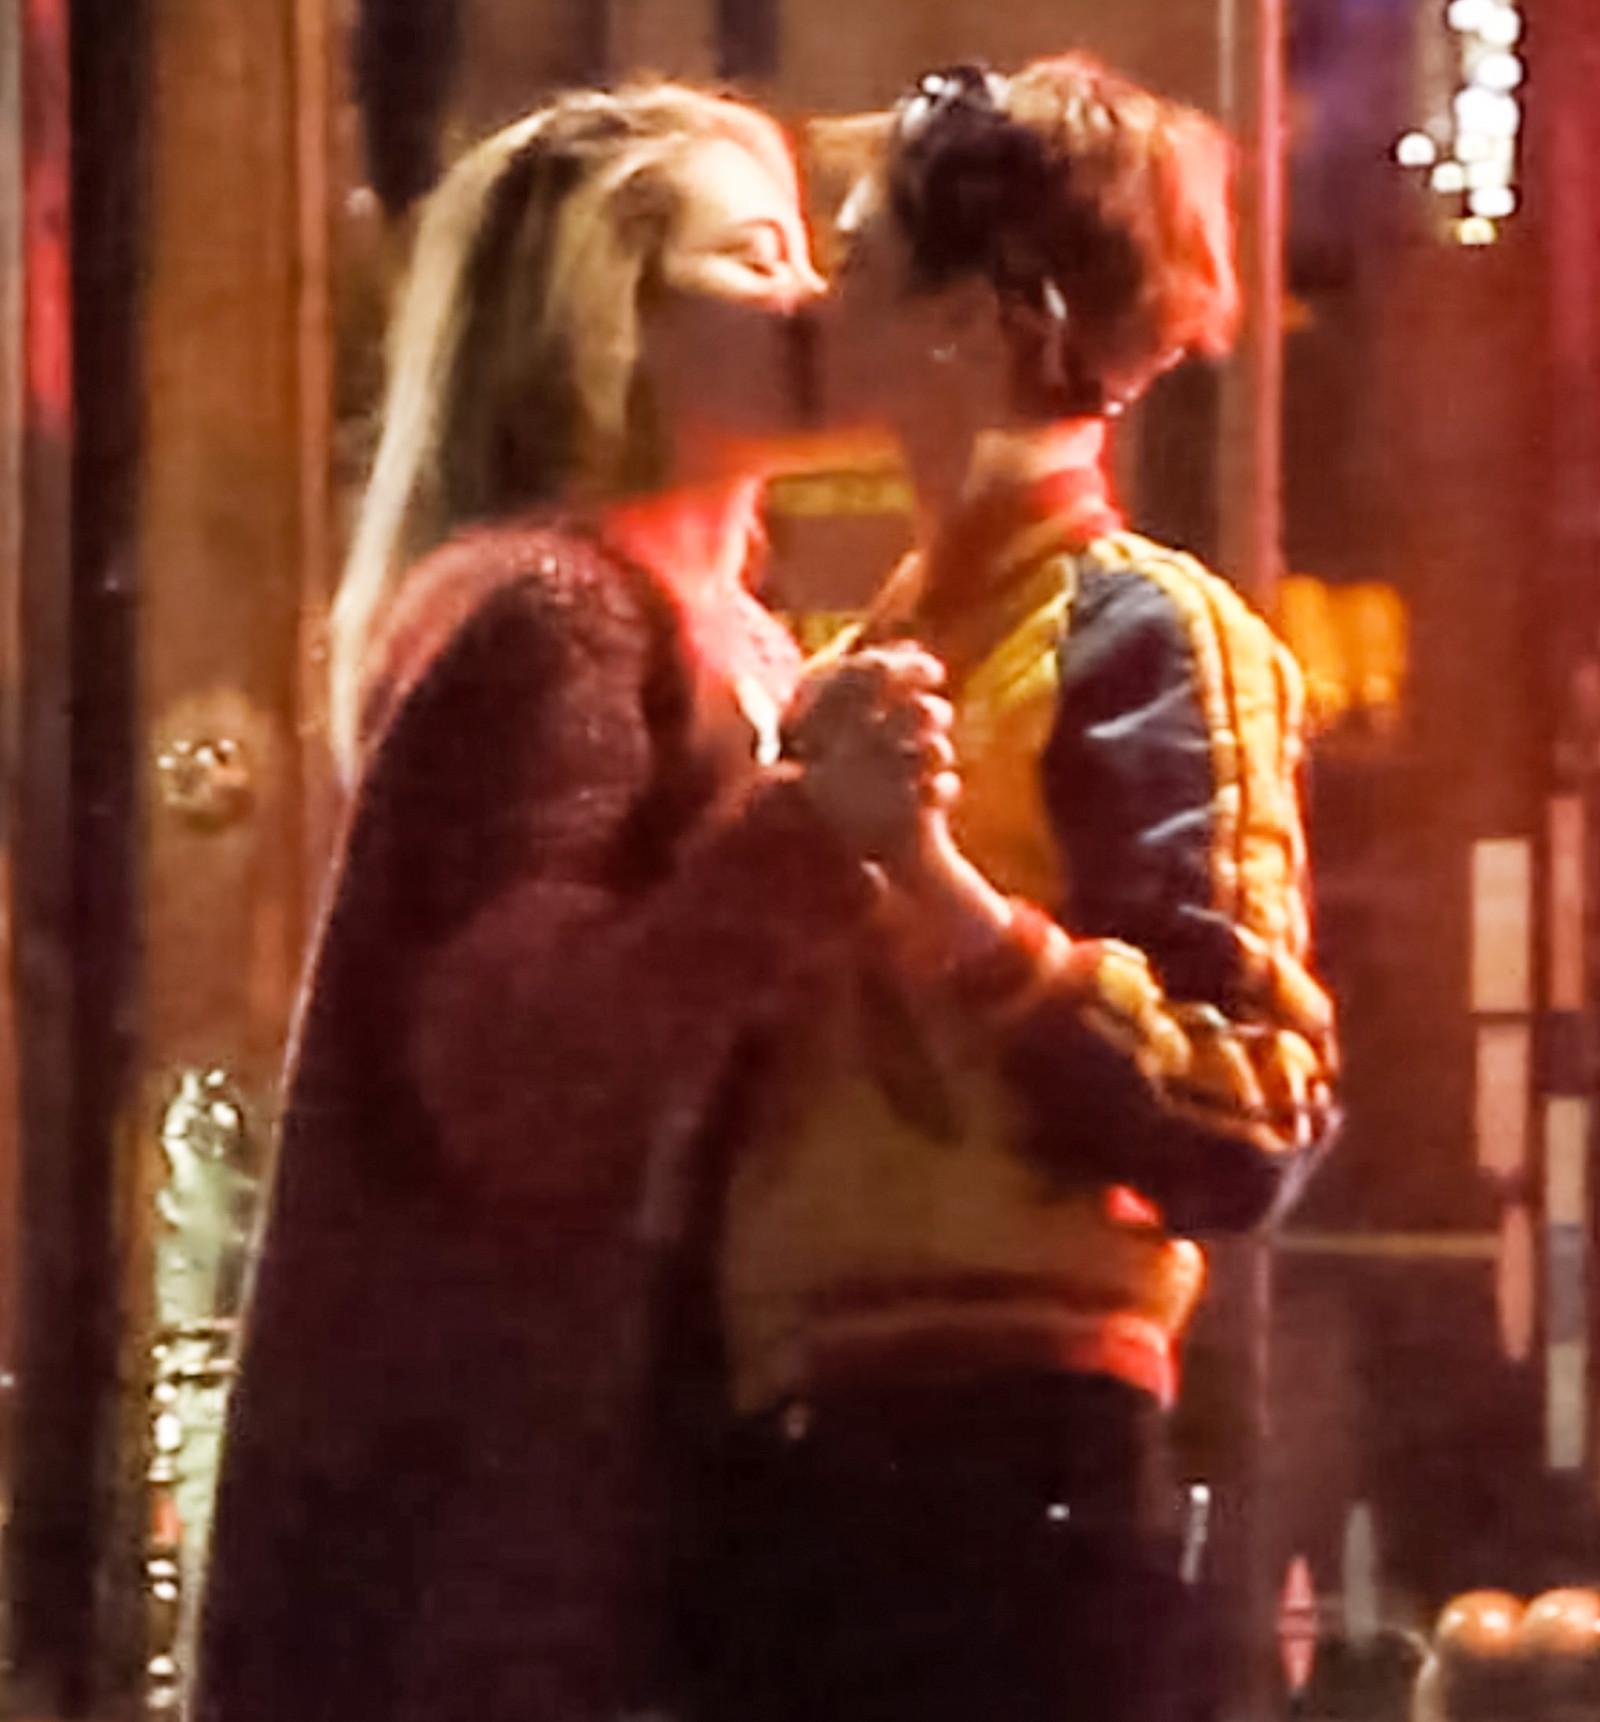 paris-jackson-cara-delevingne-kissing.jpg